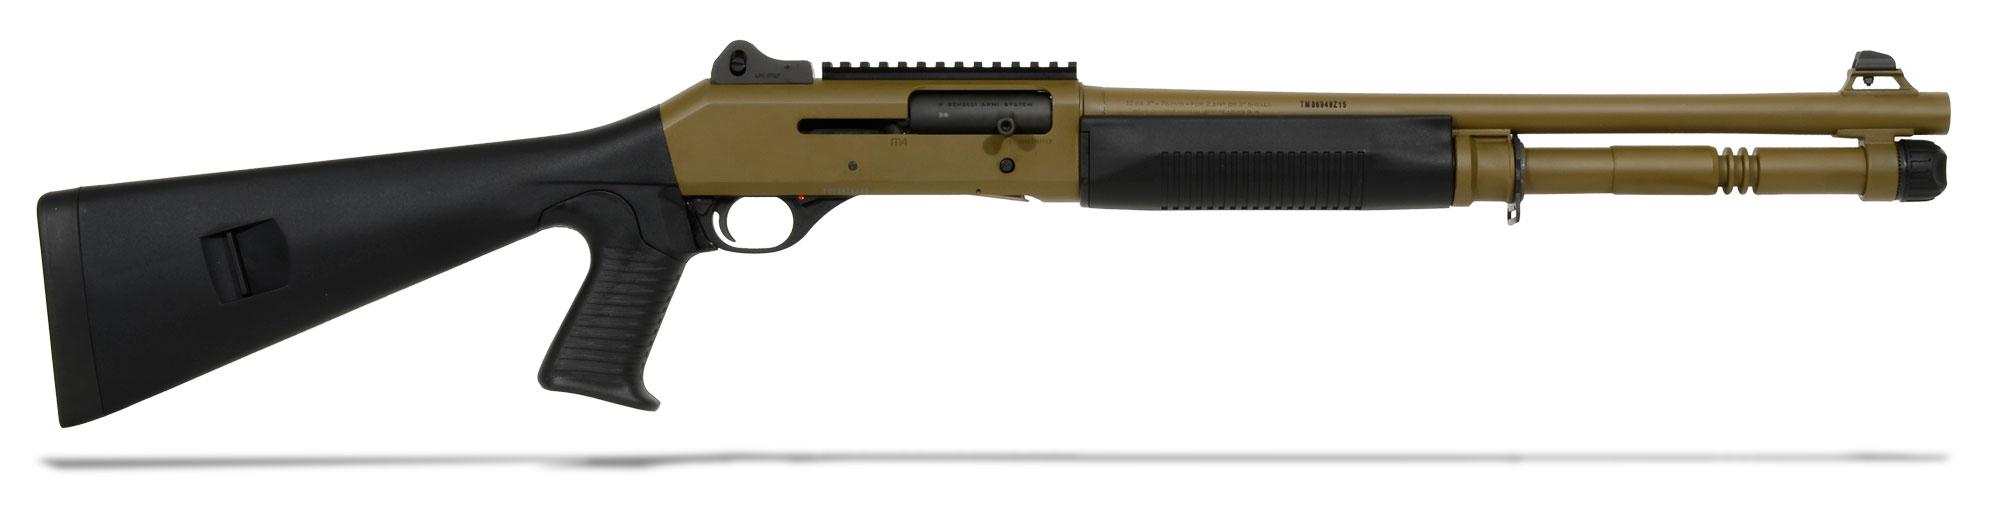 Benelli M4 12GA Pistol Grip Dark Earth 11791